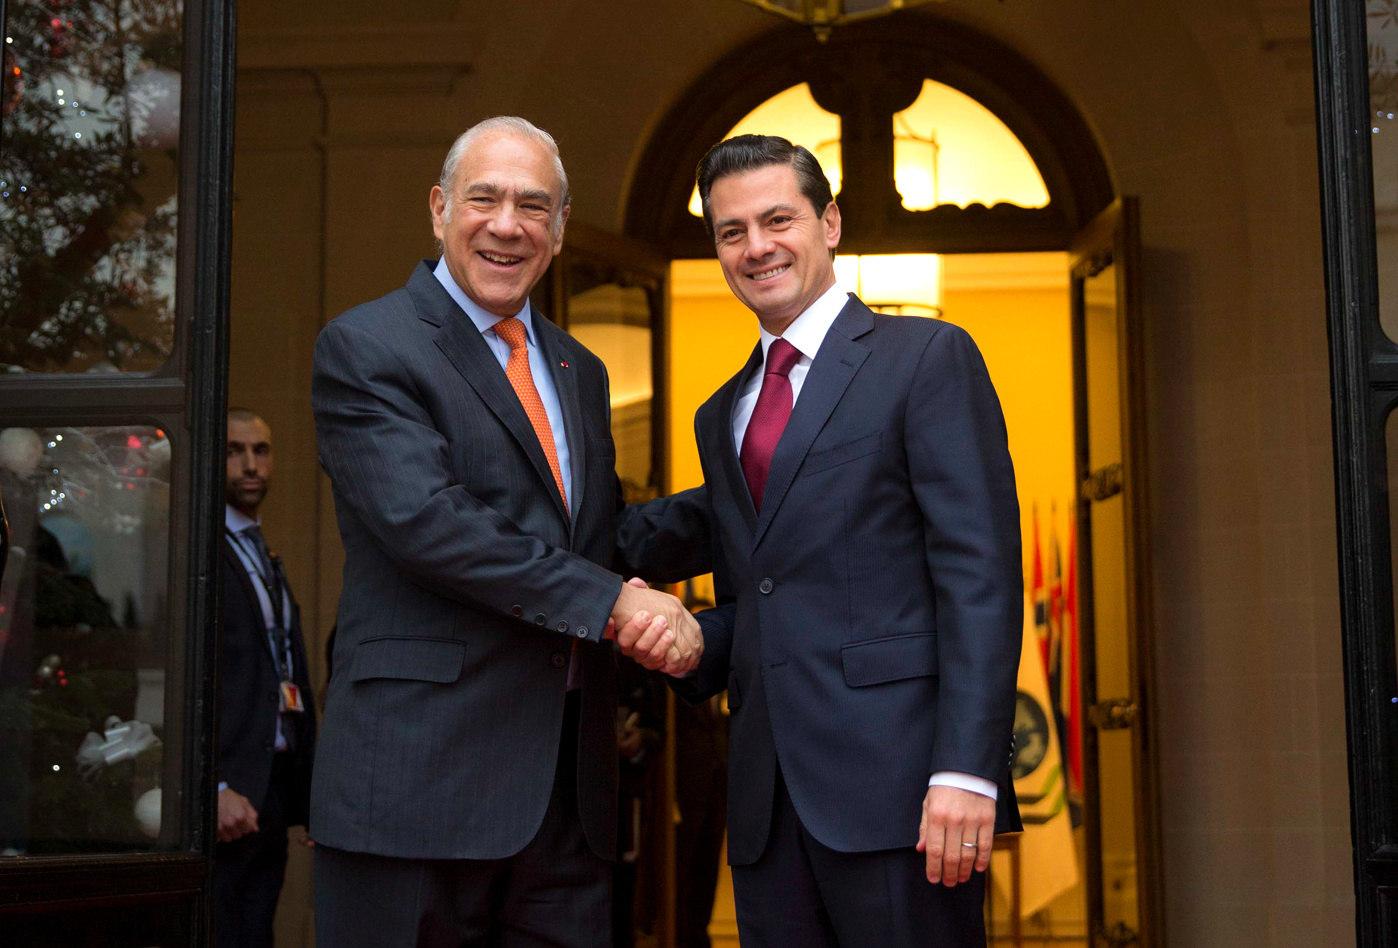 Enrique Peña Nieto inicia gira de trabajo en Francia